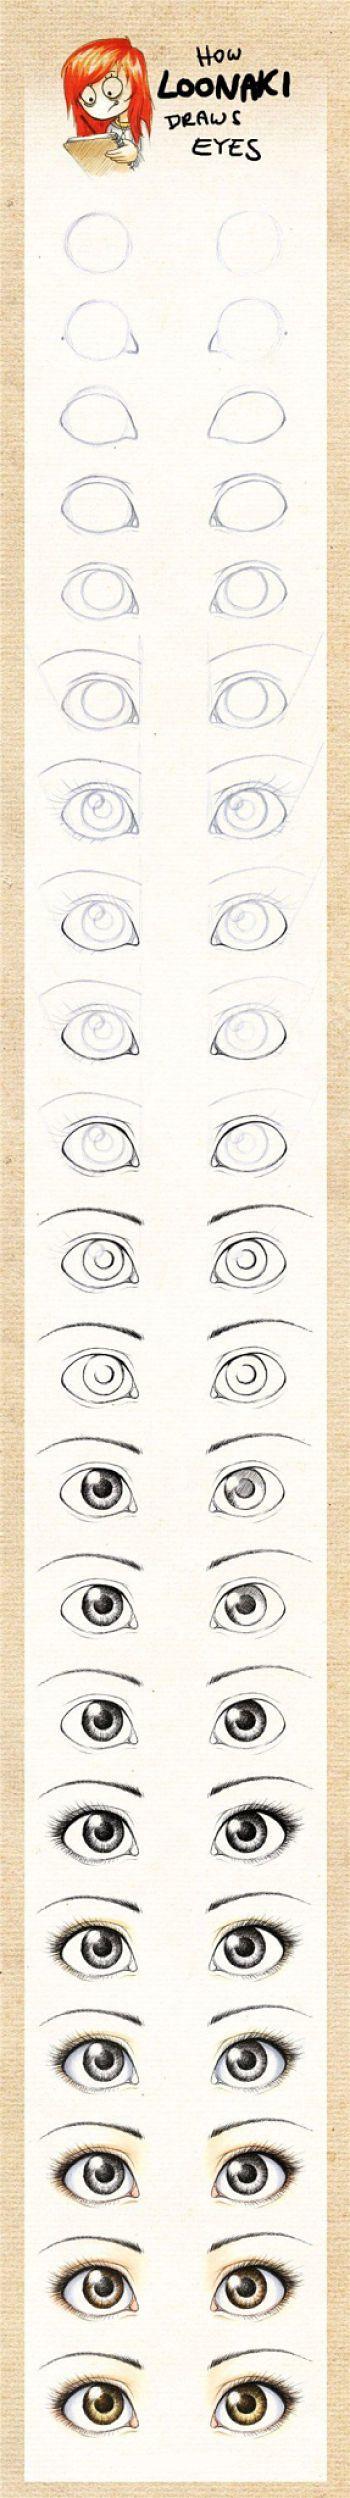 como-dibujar-ojos-animados-paso-a-paso